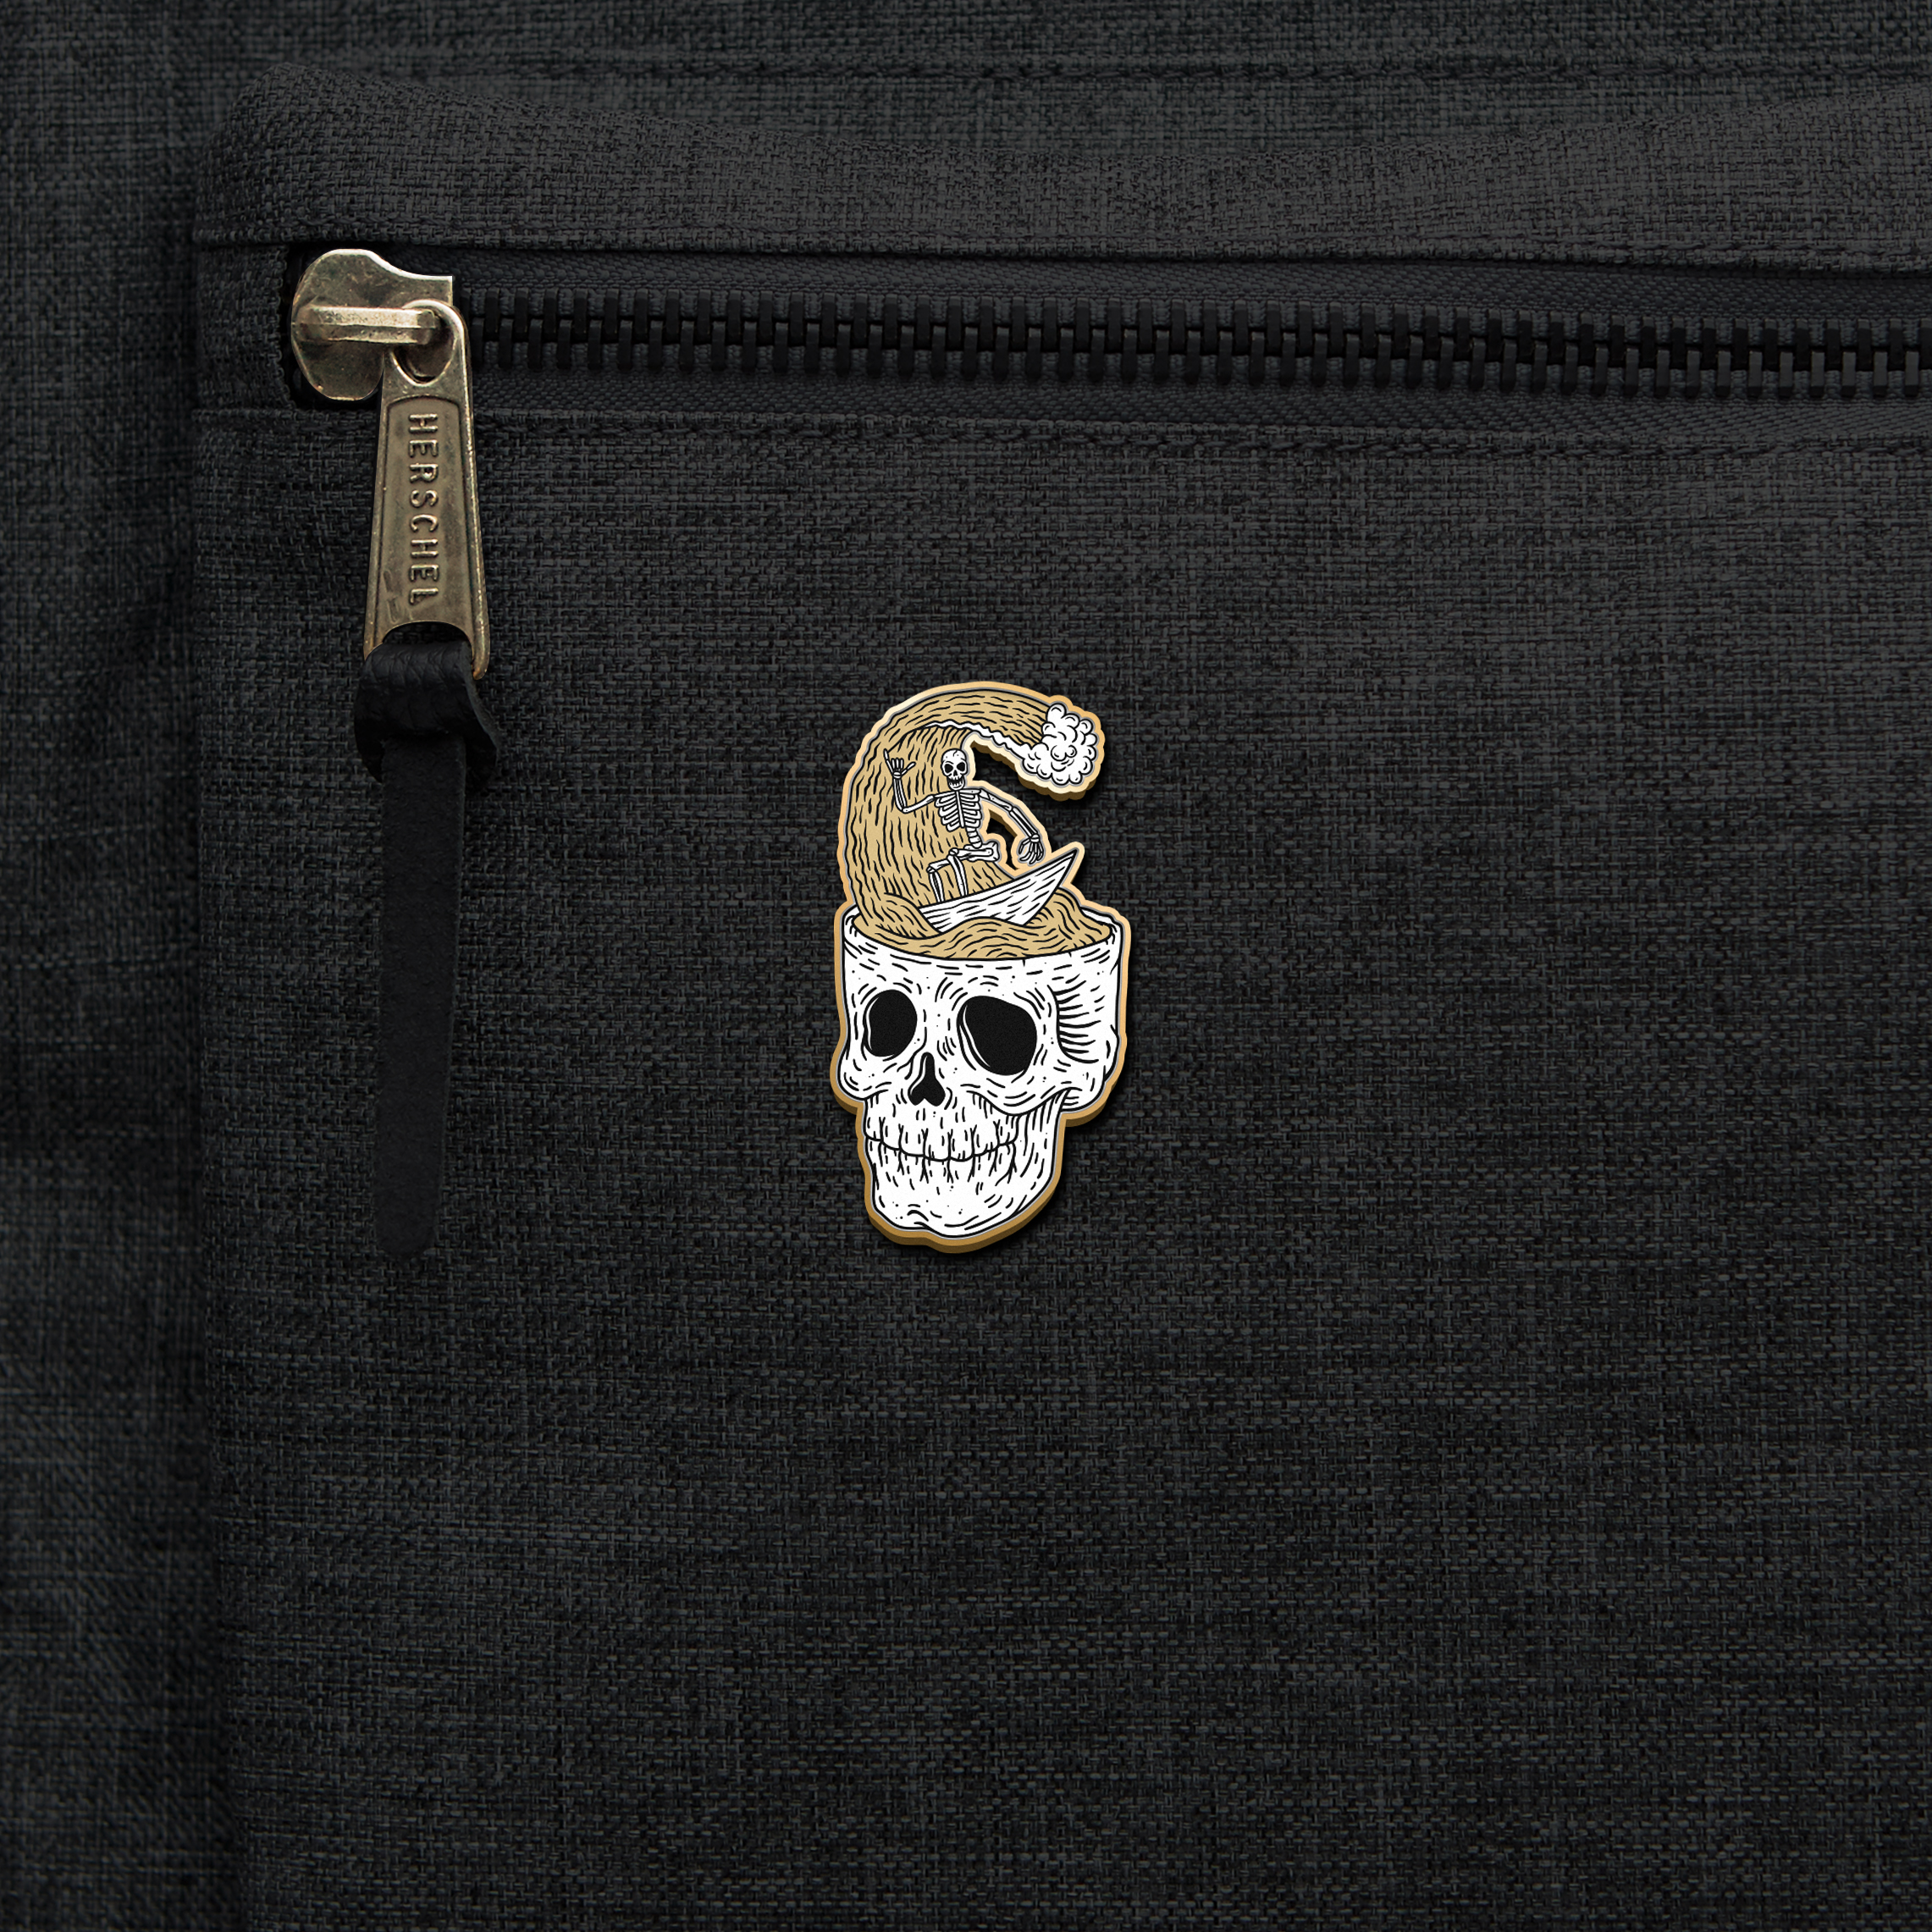 SurfBrain-Pin-Backpack.jpg